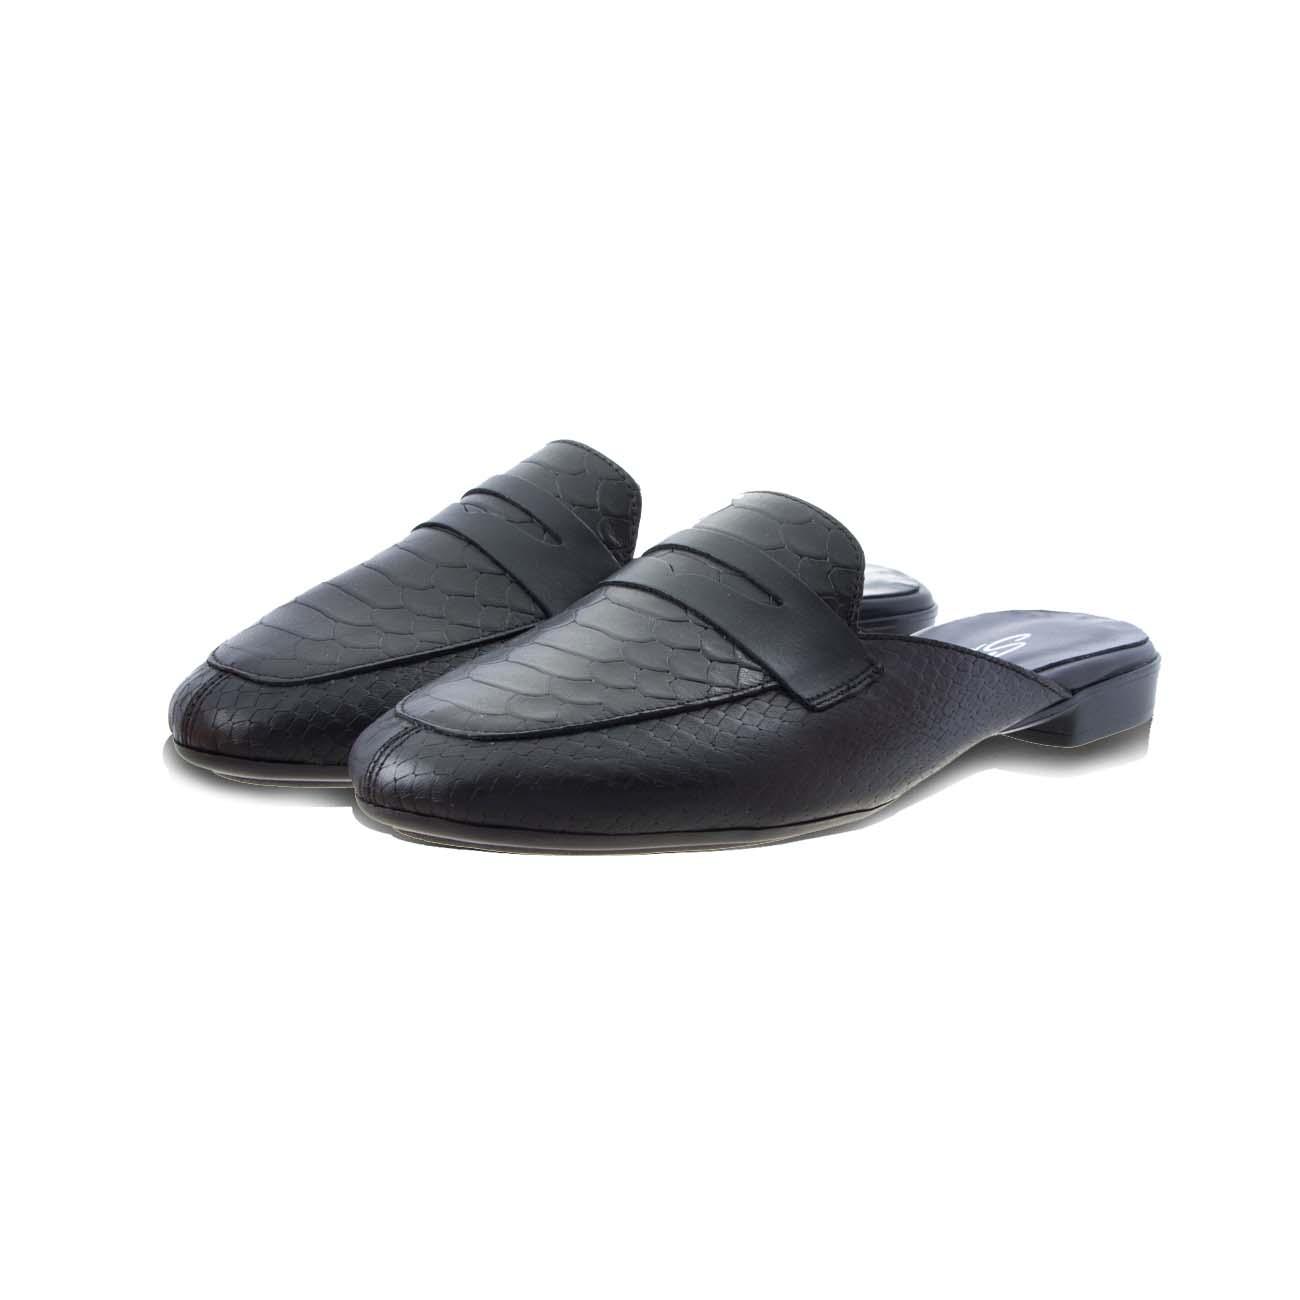 Mule μοκασίνια από δέρμα φίδι πατάκι δερμάτινο μαύρο SANTE 20-123-01